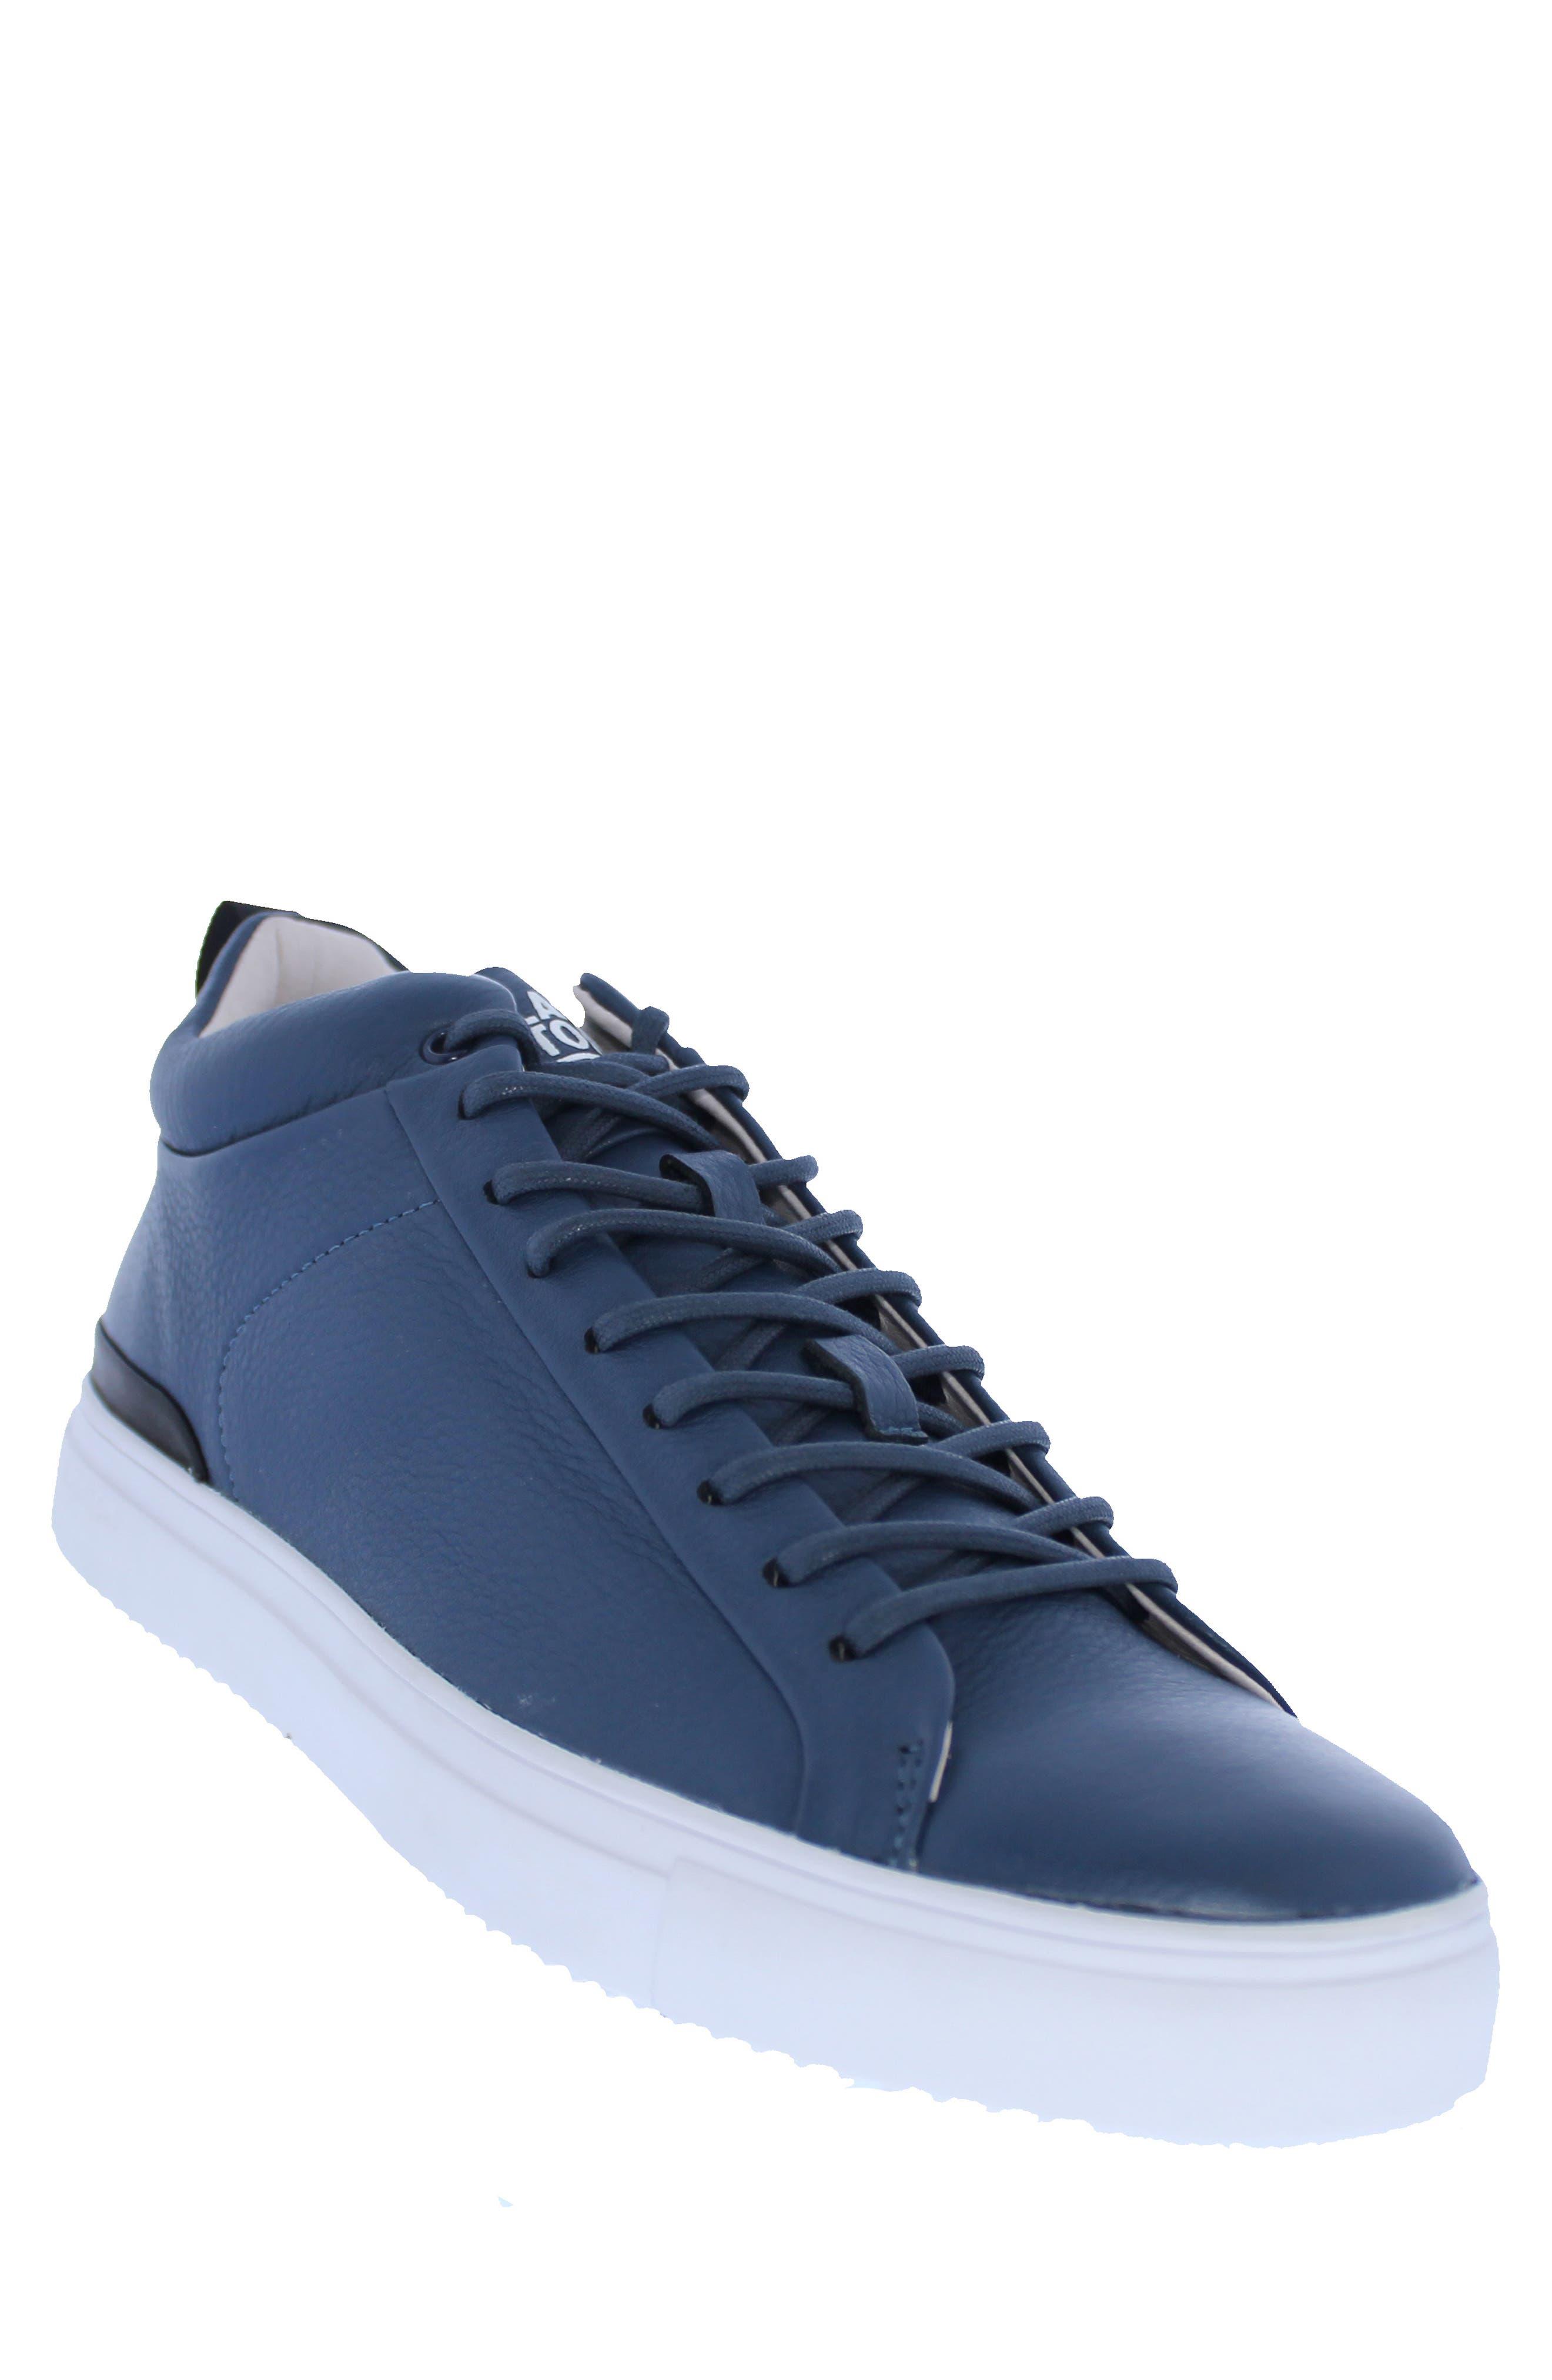 Men's Blackstone Shoes   Nordstrom